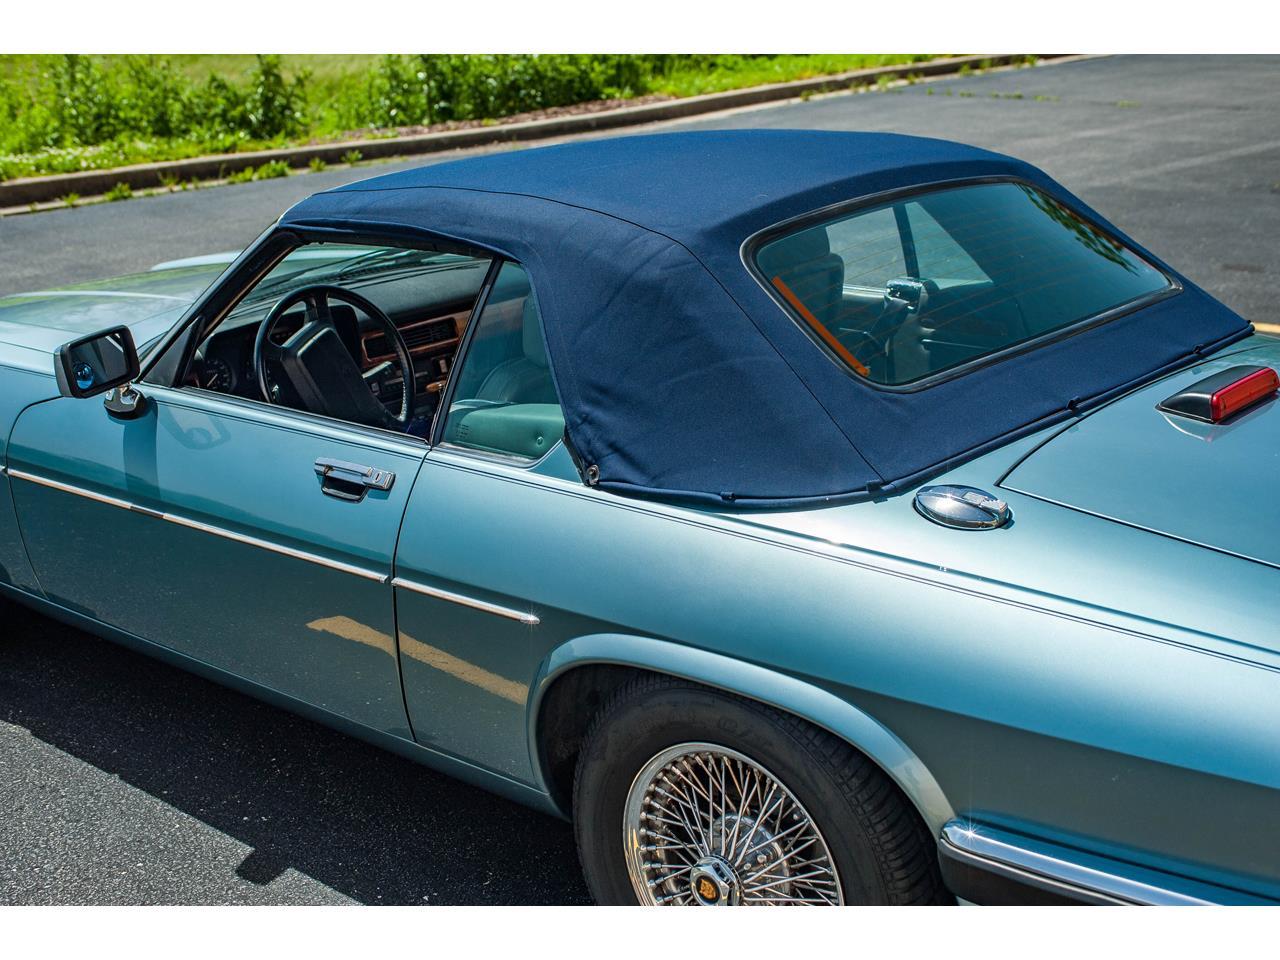 Large Picture of 1990 Jaguar XJS located in Illinois - $15,500.00 - QB9E